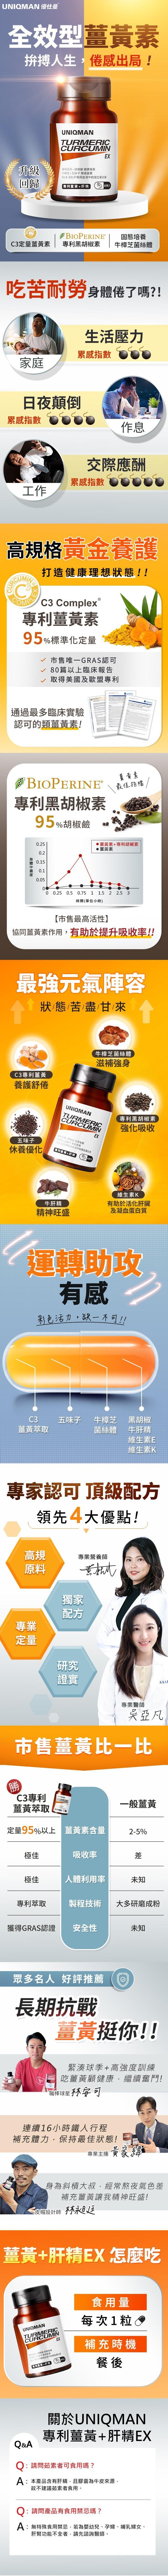 UNIQMAN-薑黃+肝精膠囊食品(60粒/瓶)產品資訊